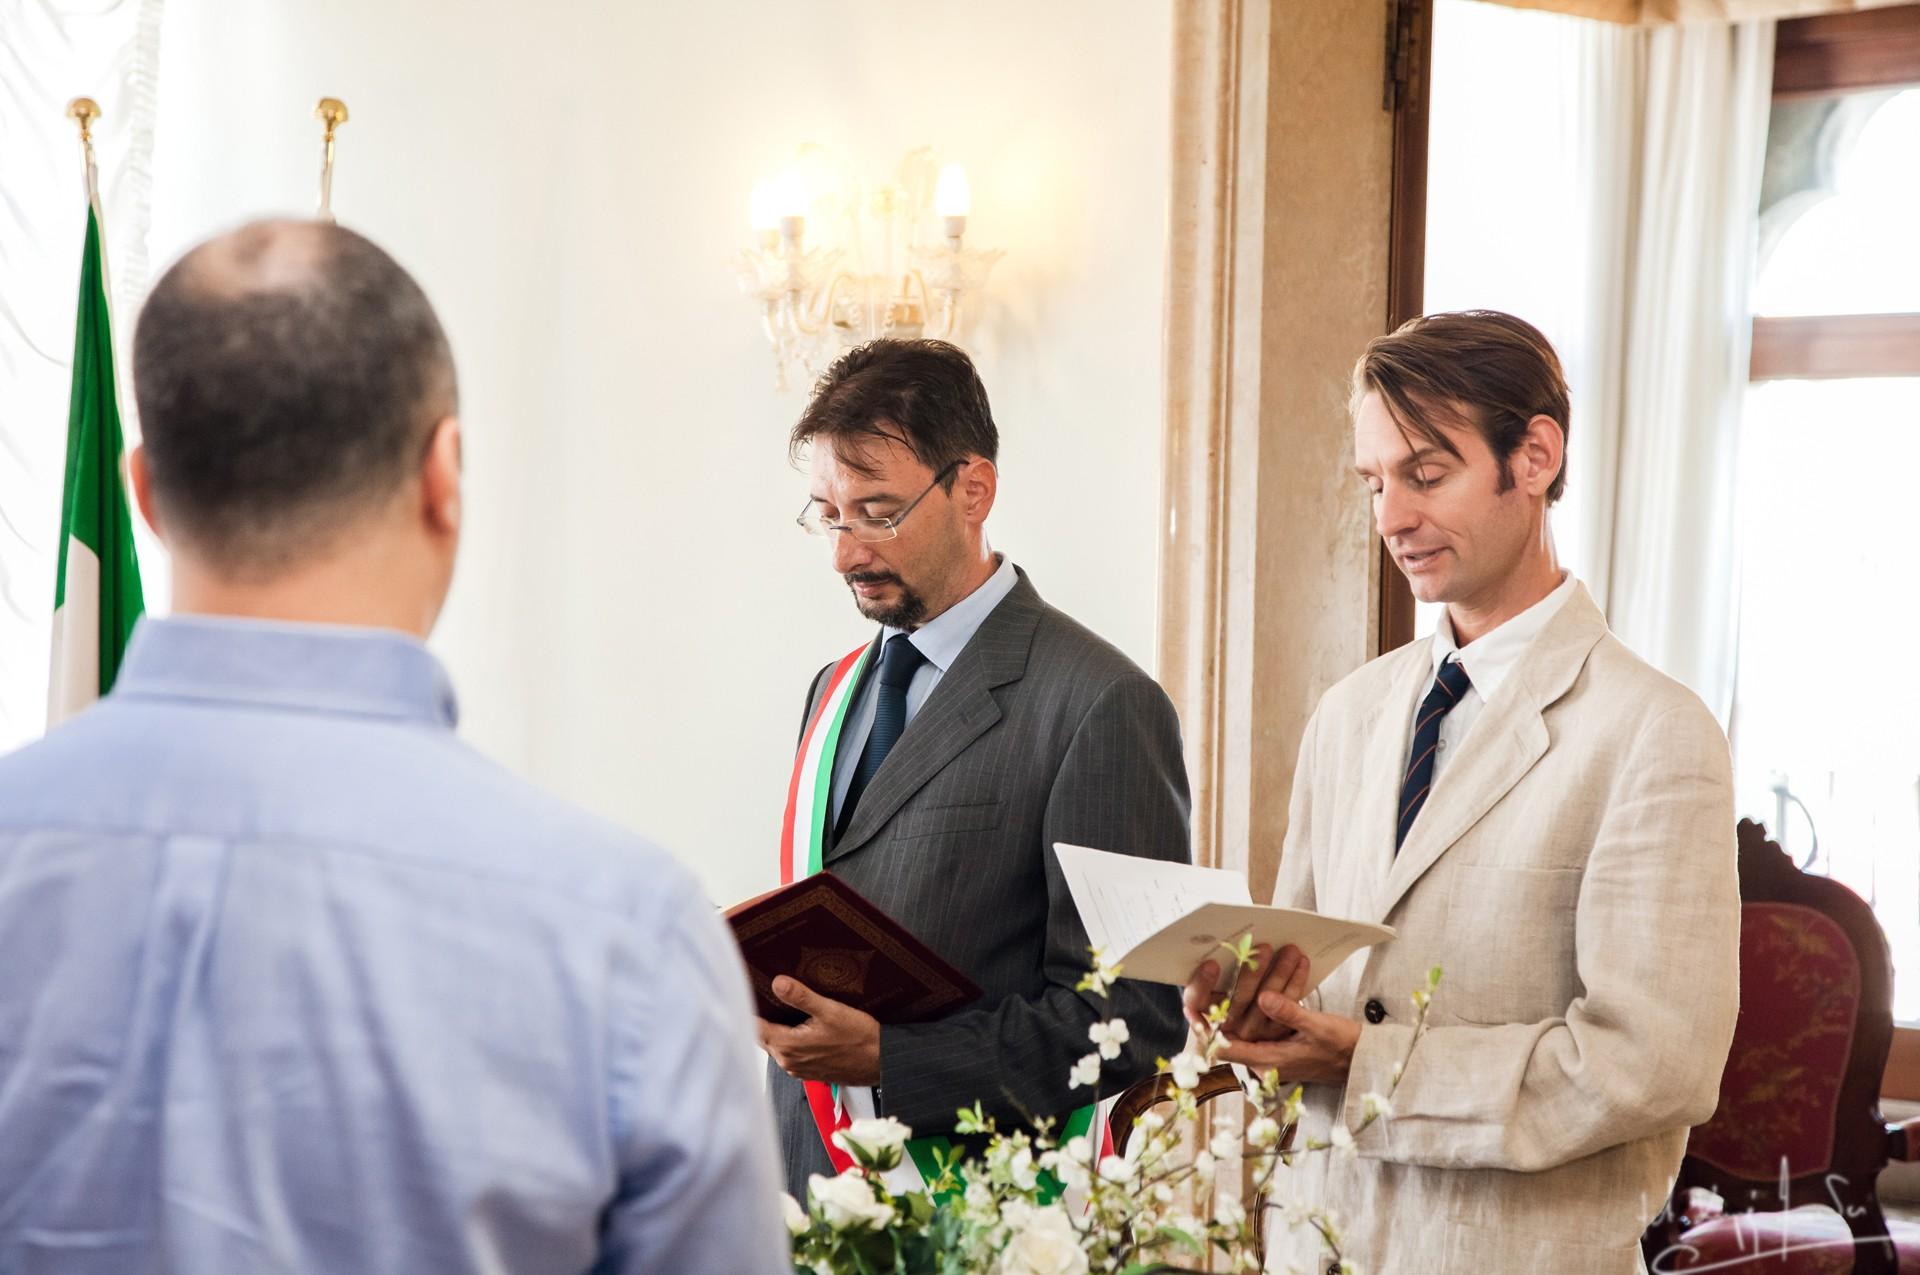 Ślub w wenecji 29 Manuela Luiza & Young Seon Song